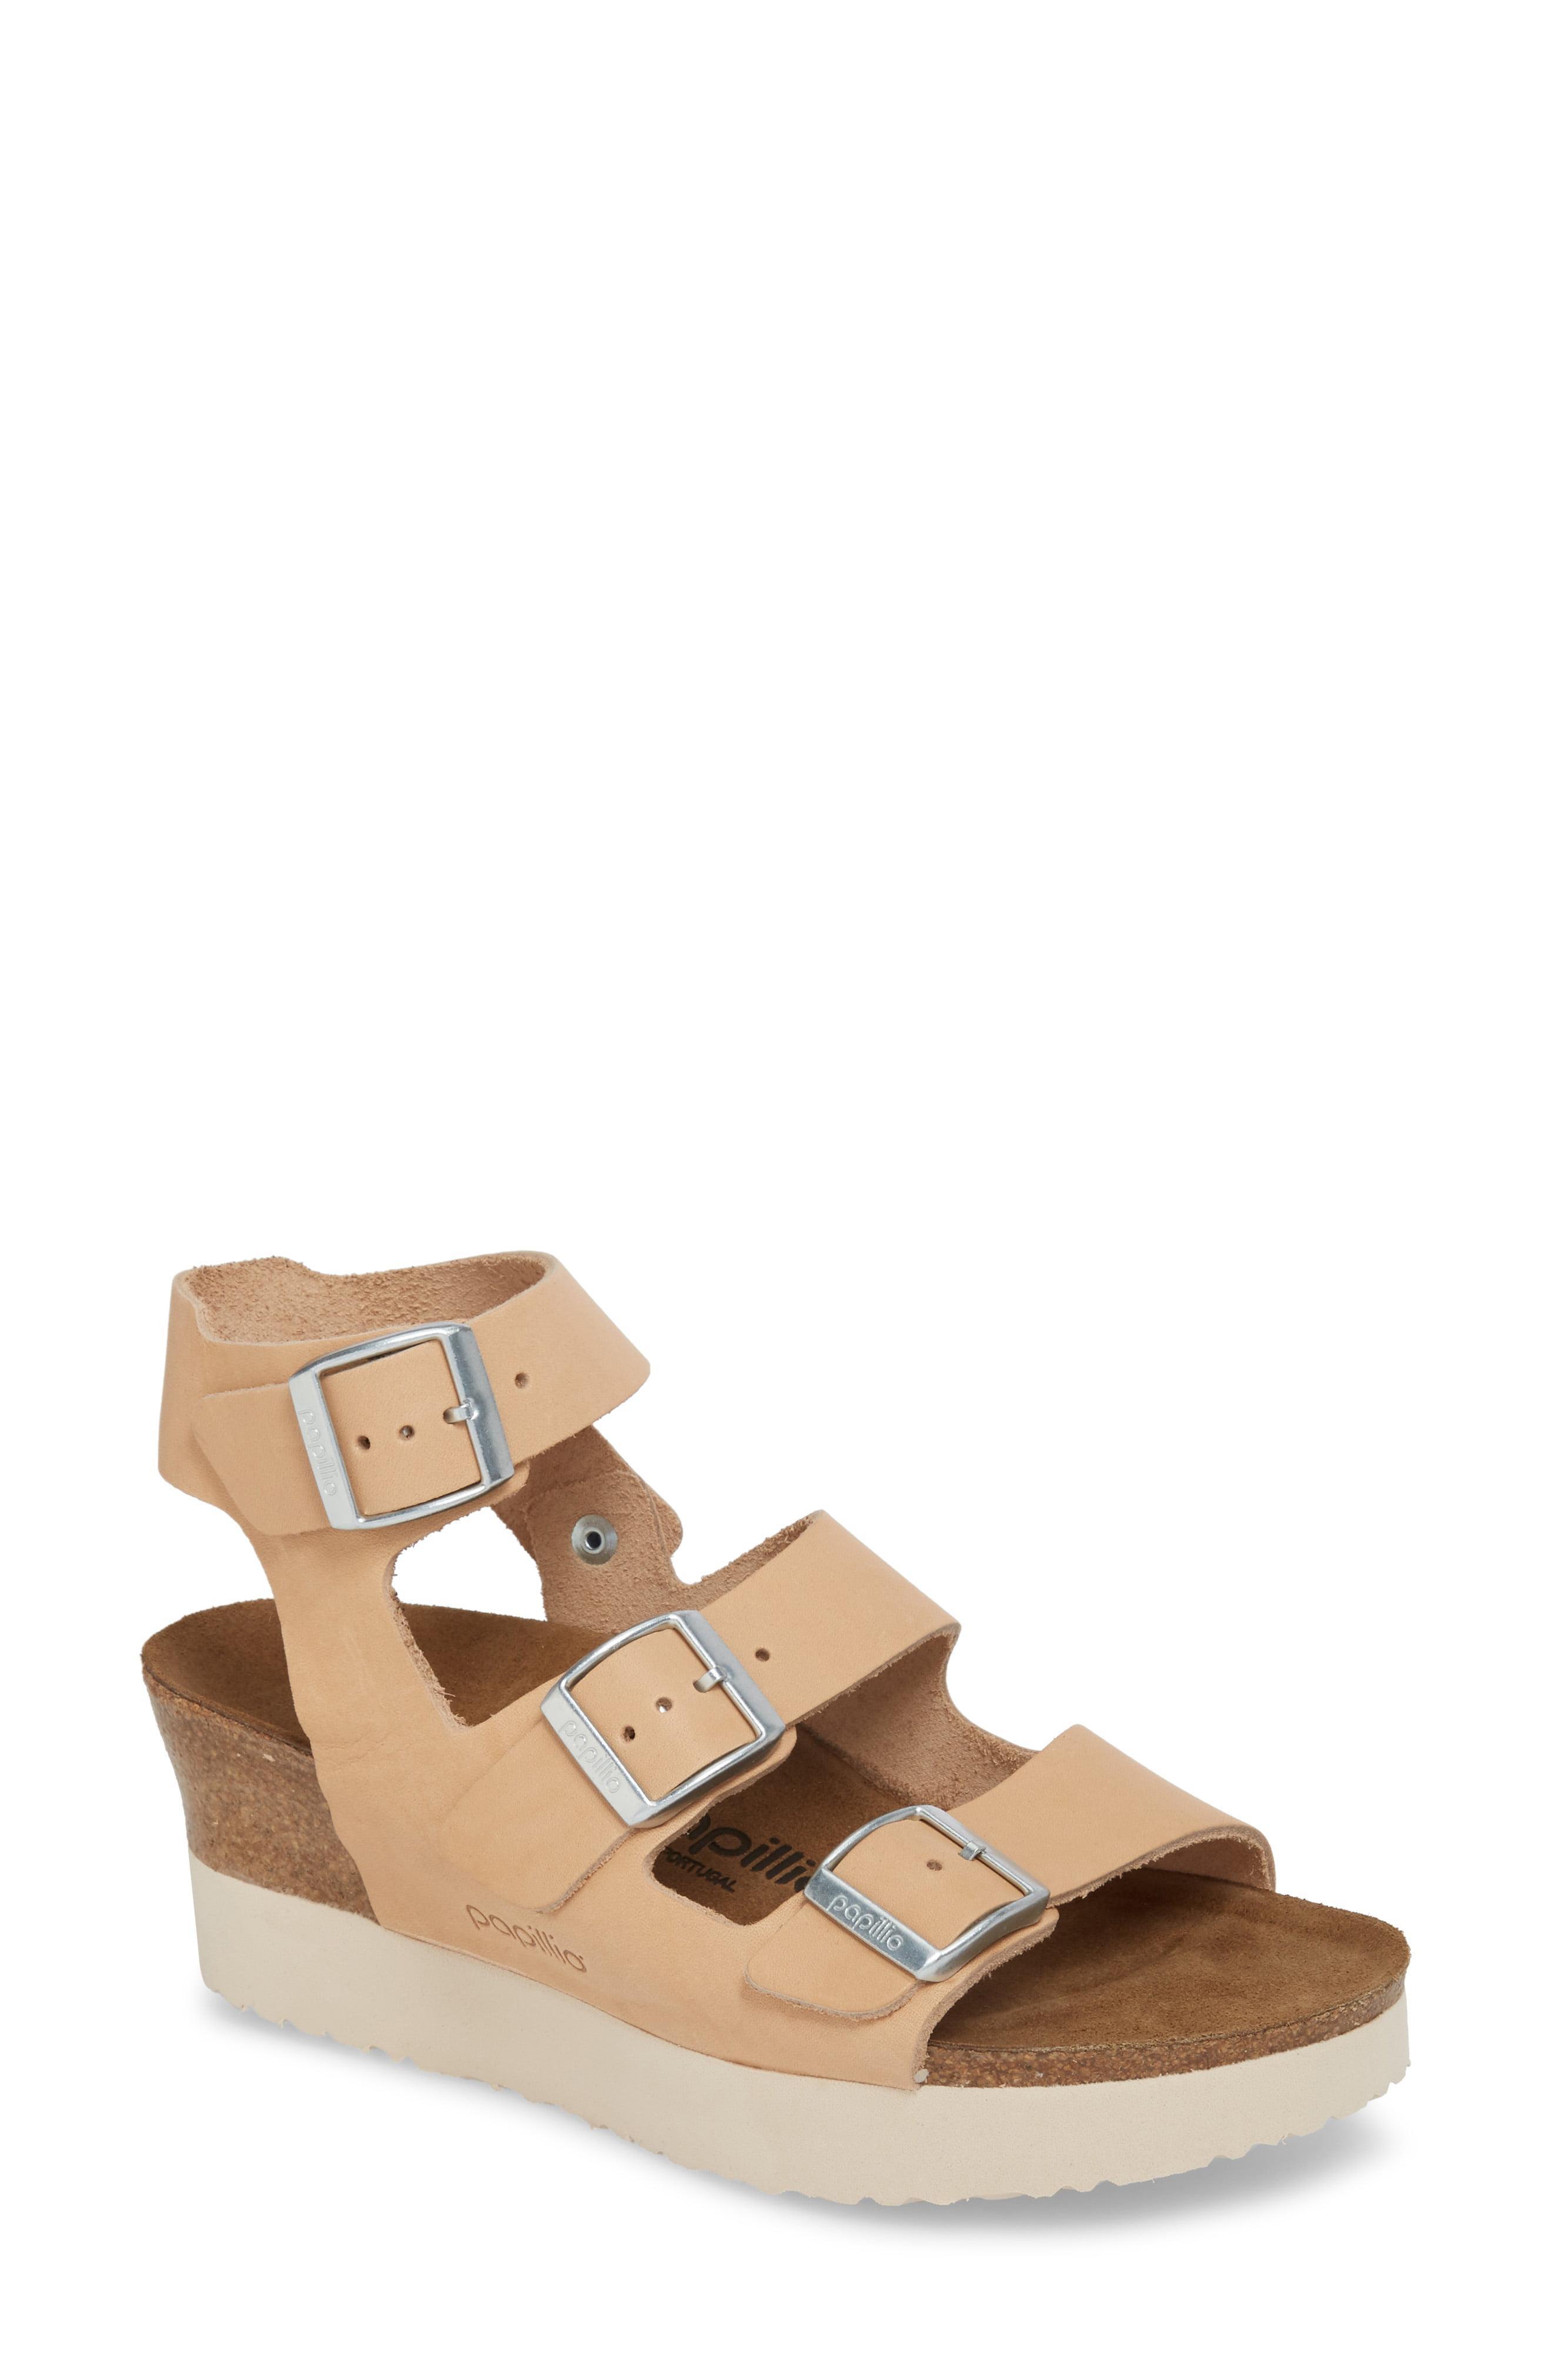 88135d84a1b Birkenstock. Women s Papillio By Linnea Platform Sandal